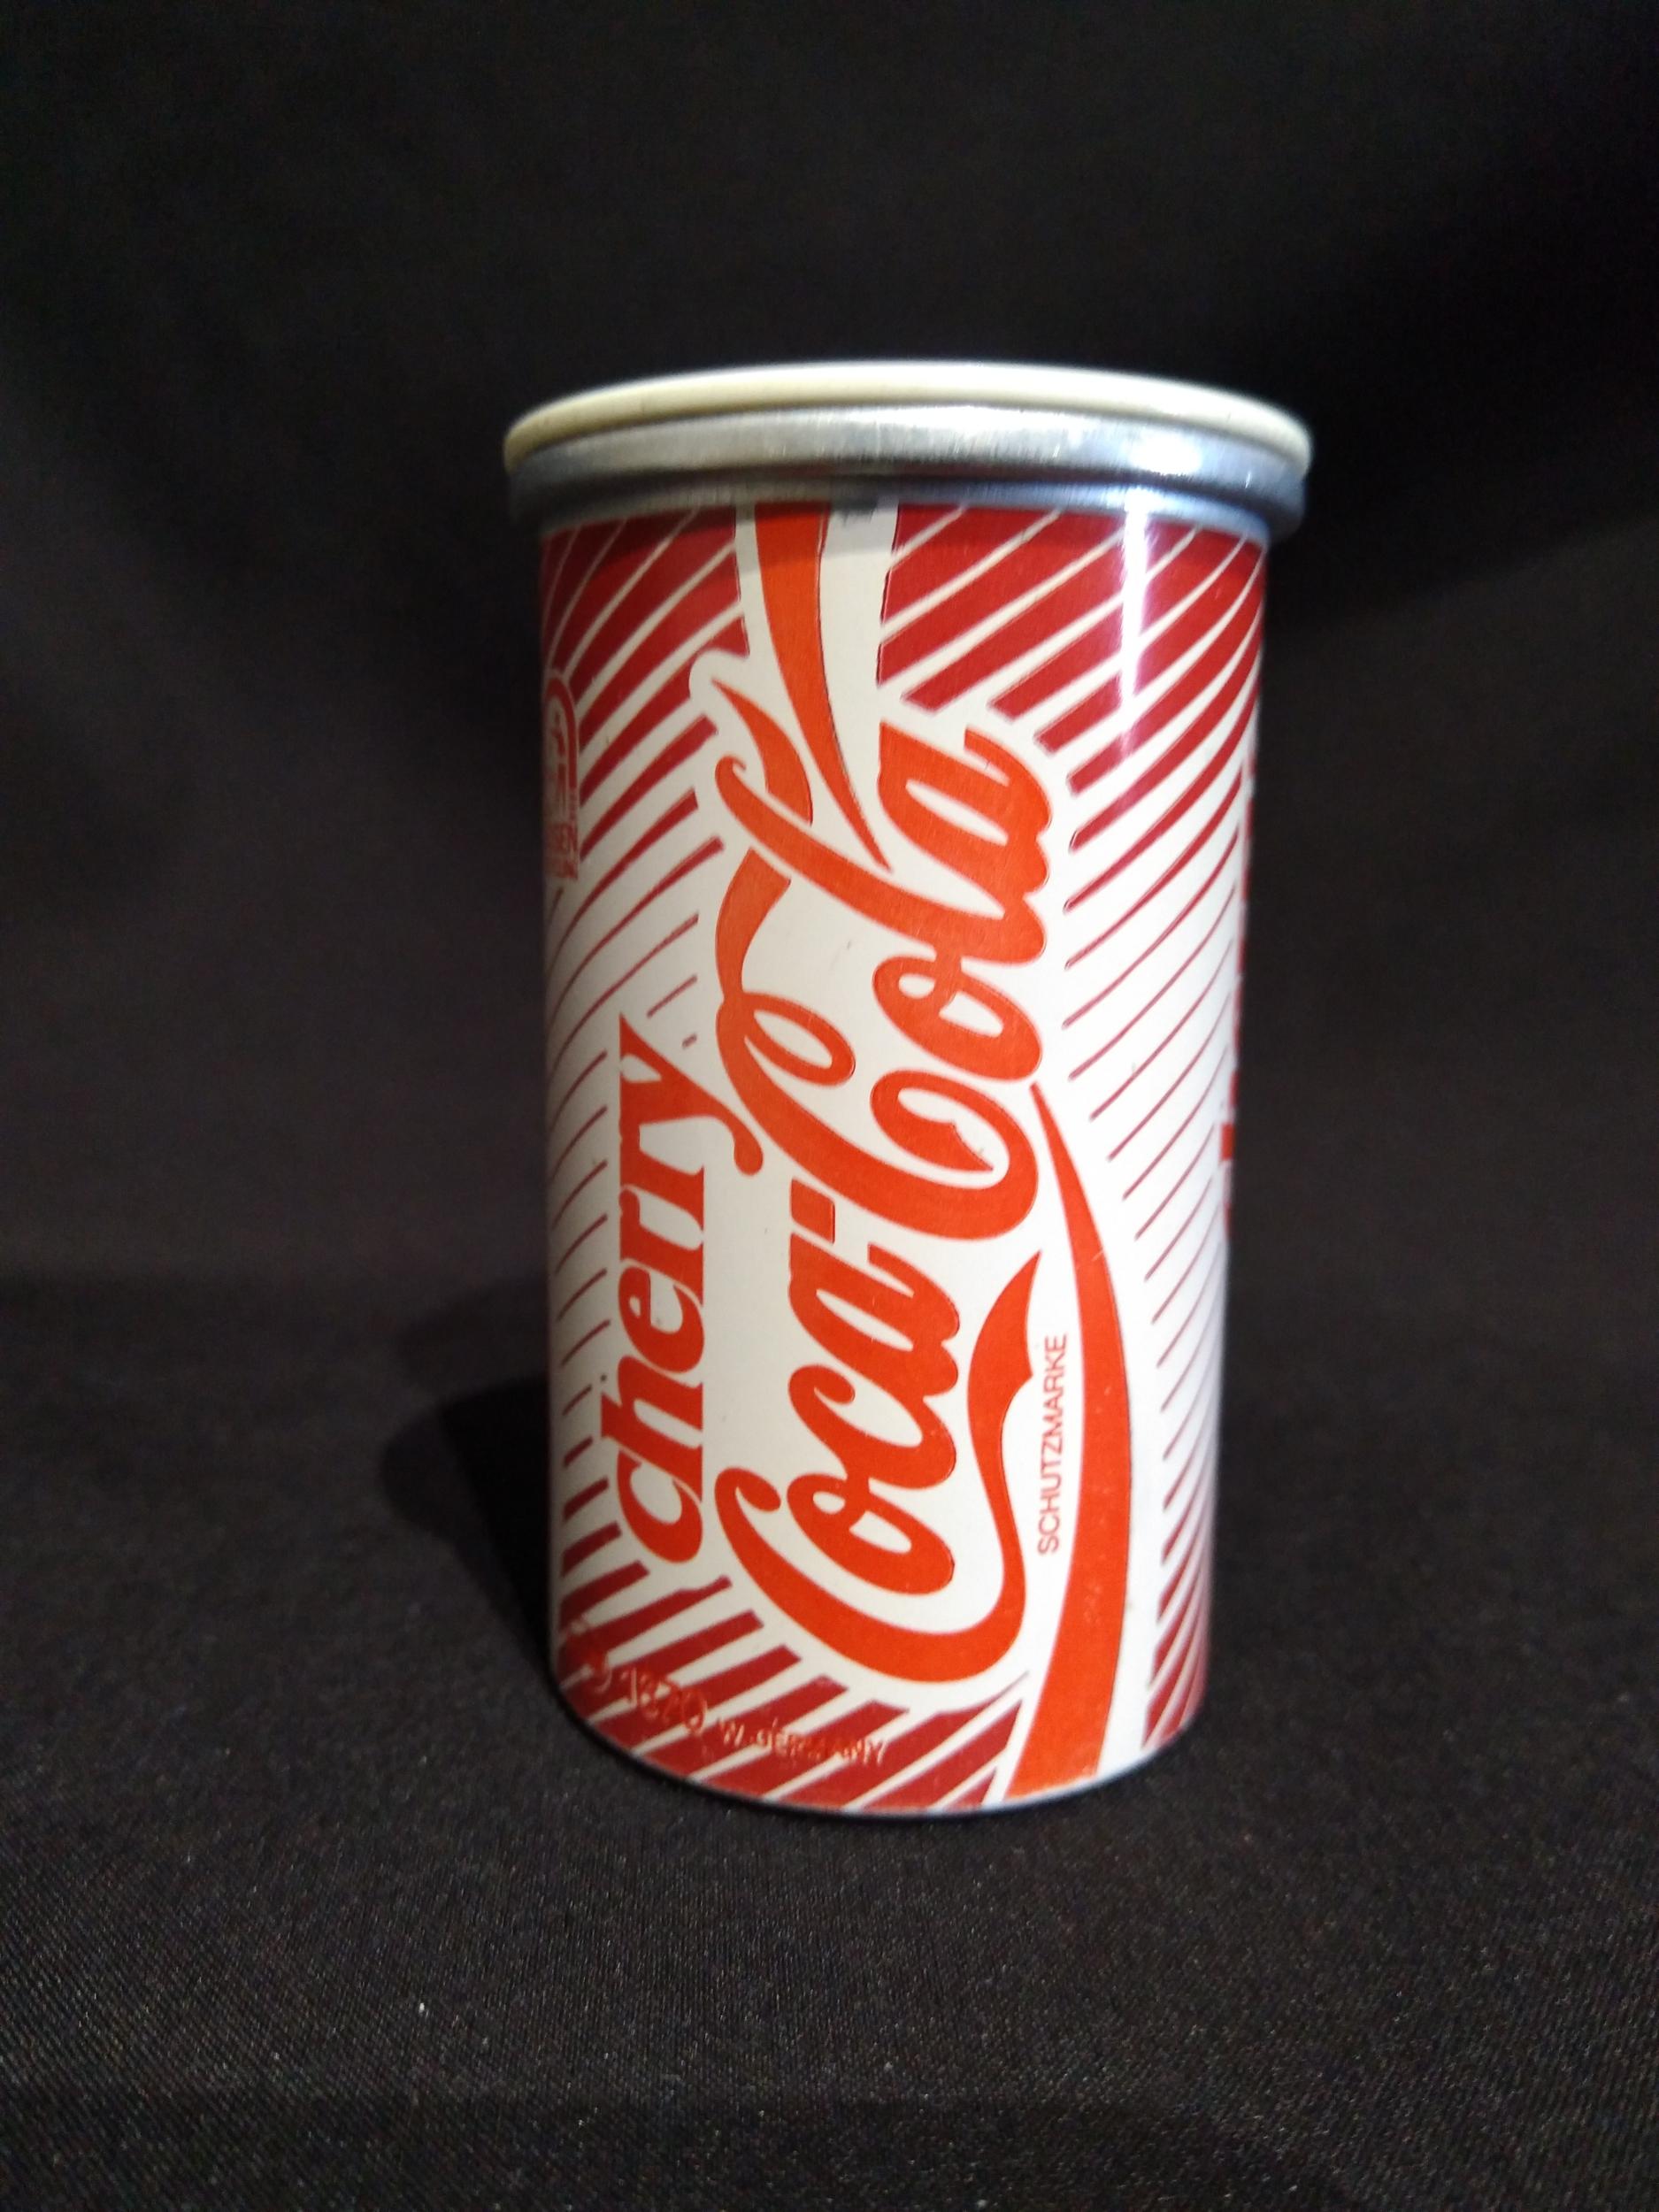 Taille-crayon publicitaire Coca-cola